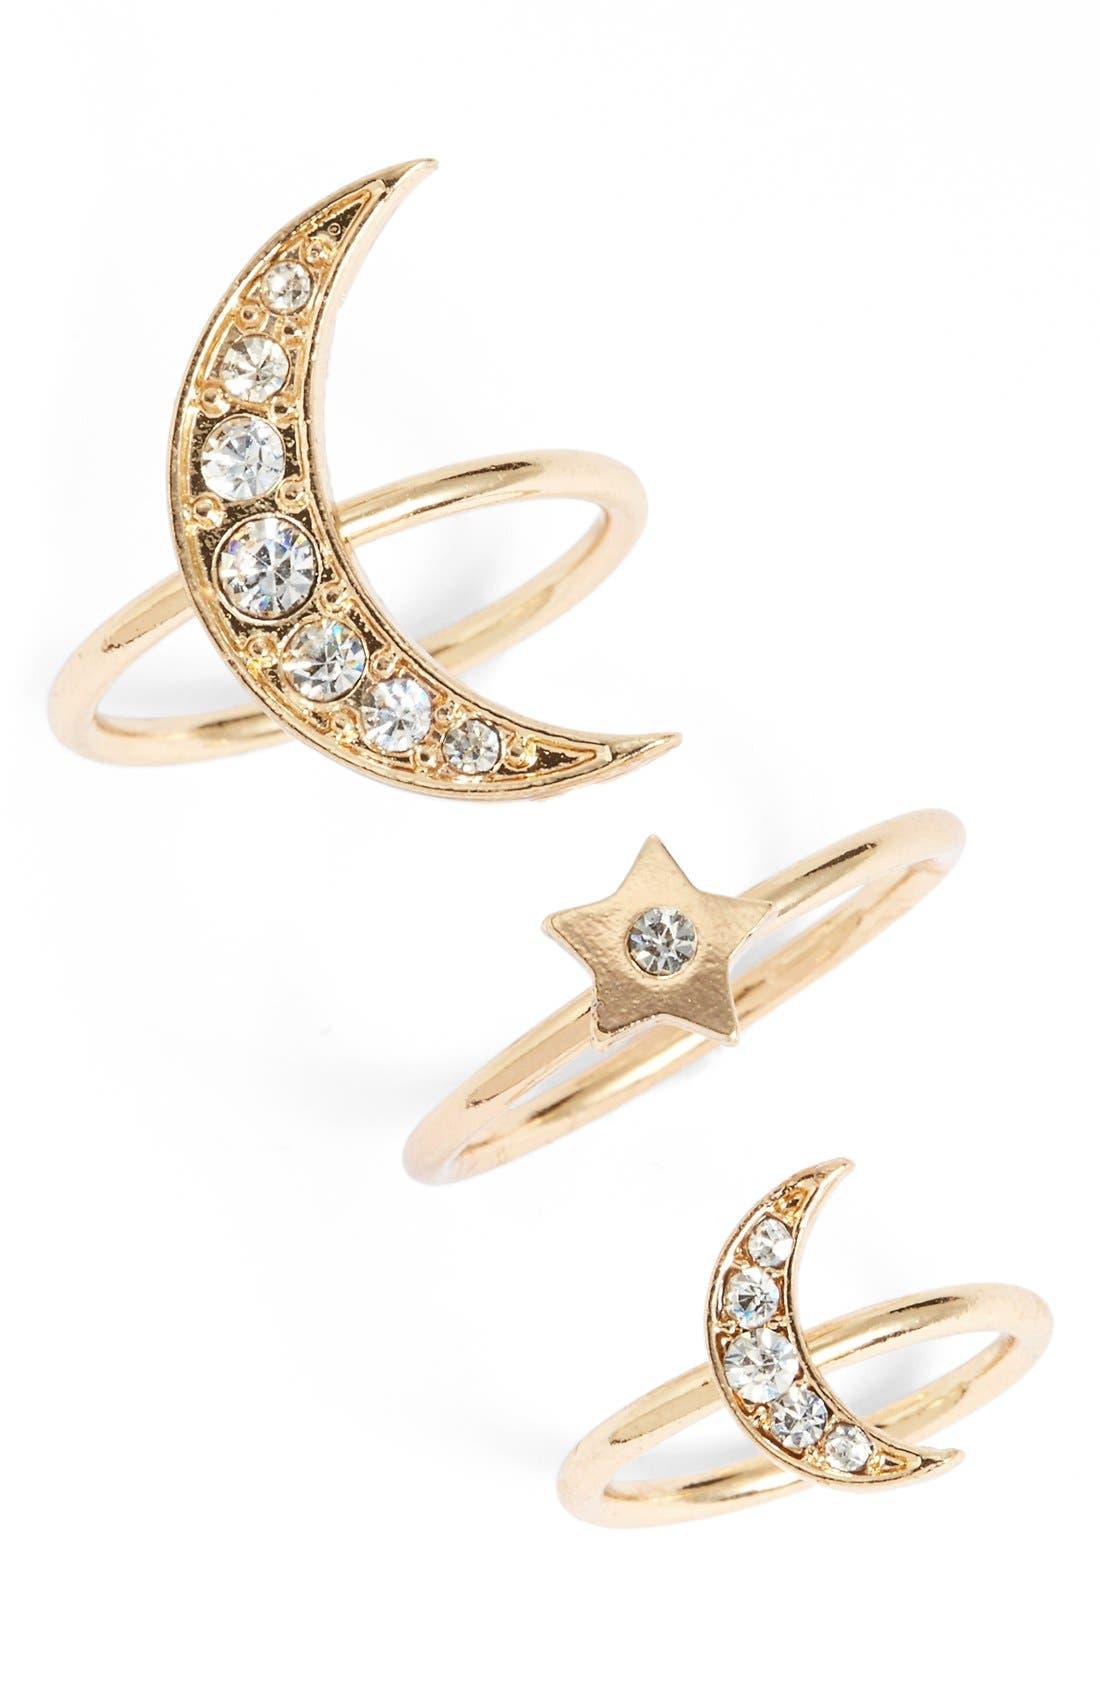 Main Image - Topshop Moon & Stars Goldtone Rings (Set of 3)